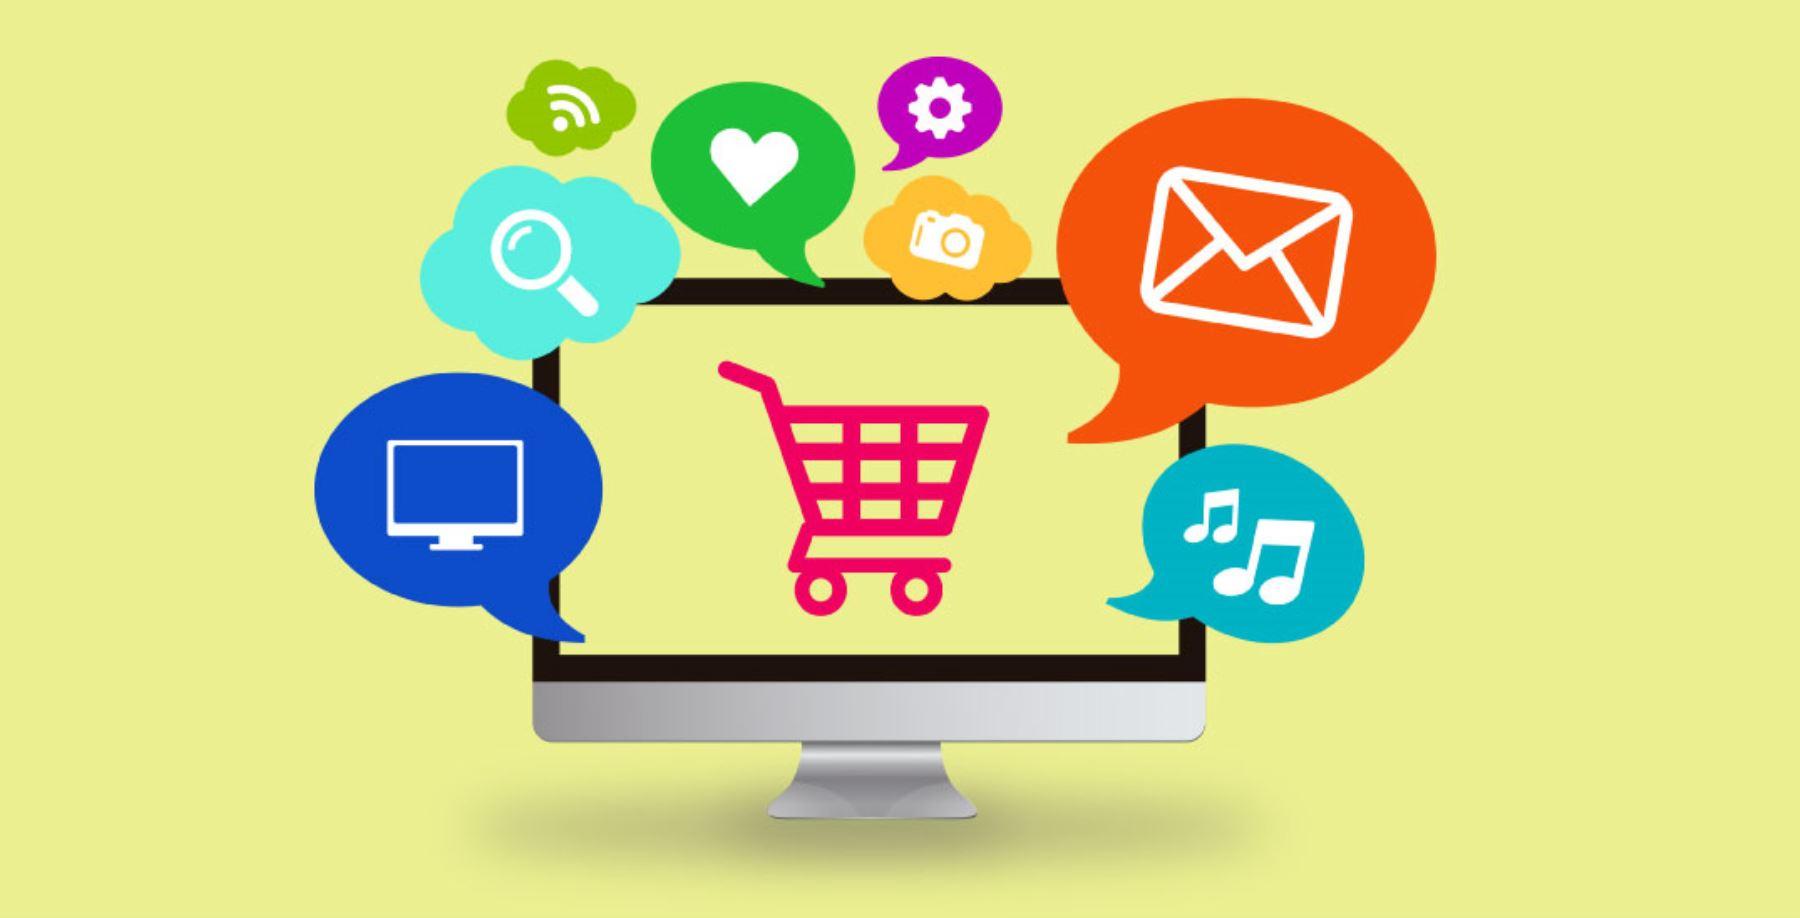 9ba1d3202 Cinco consejos para comprar online de manera segura